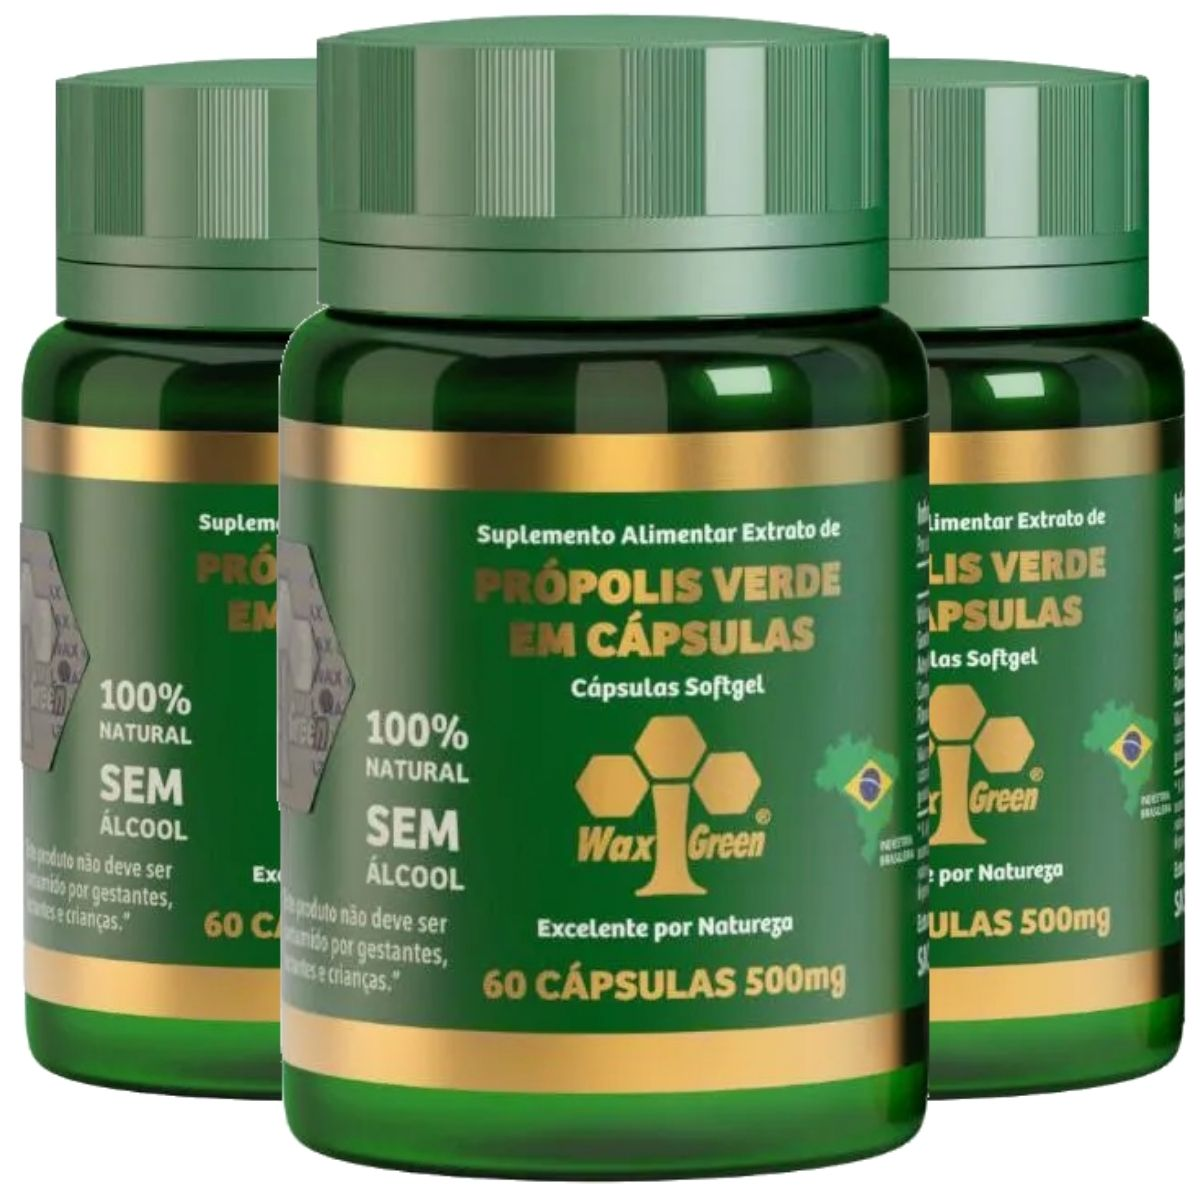 Kit 3 Própolis Verde 86% + Ômega 3 60 Cápsulas 500mg - Wax Green